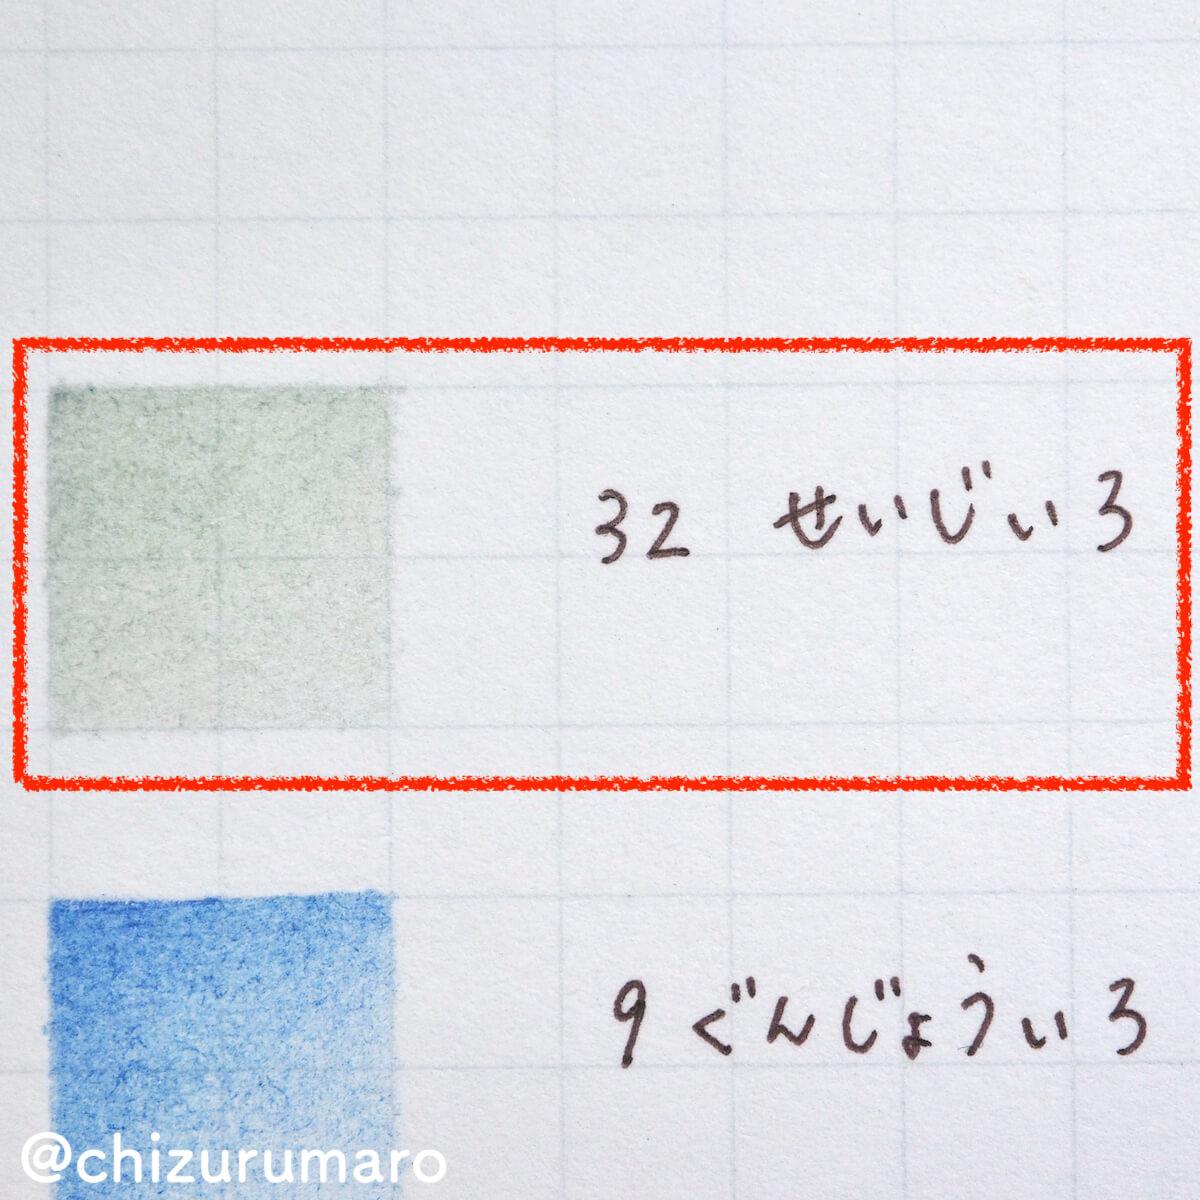 f:id:chizurumaro:20200717222150j:plain